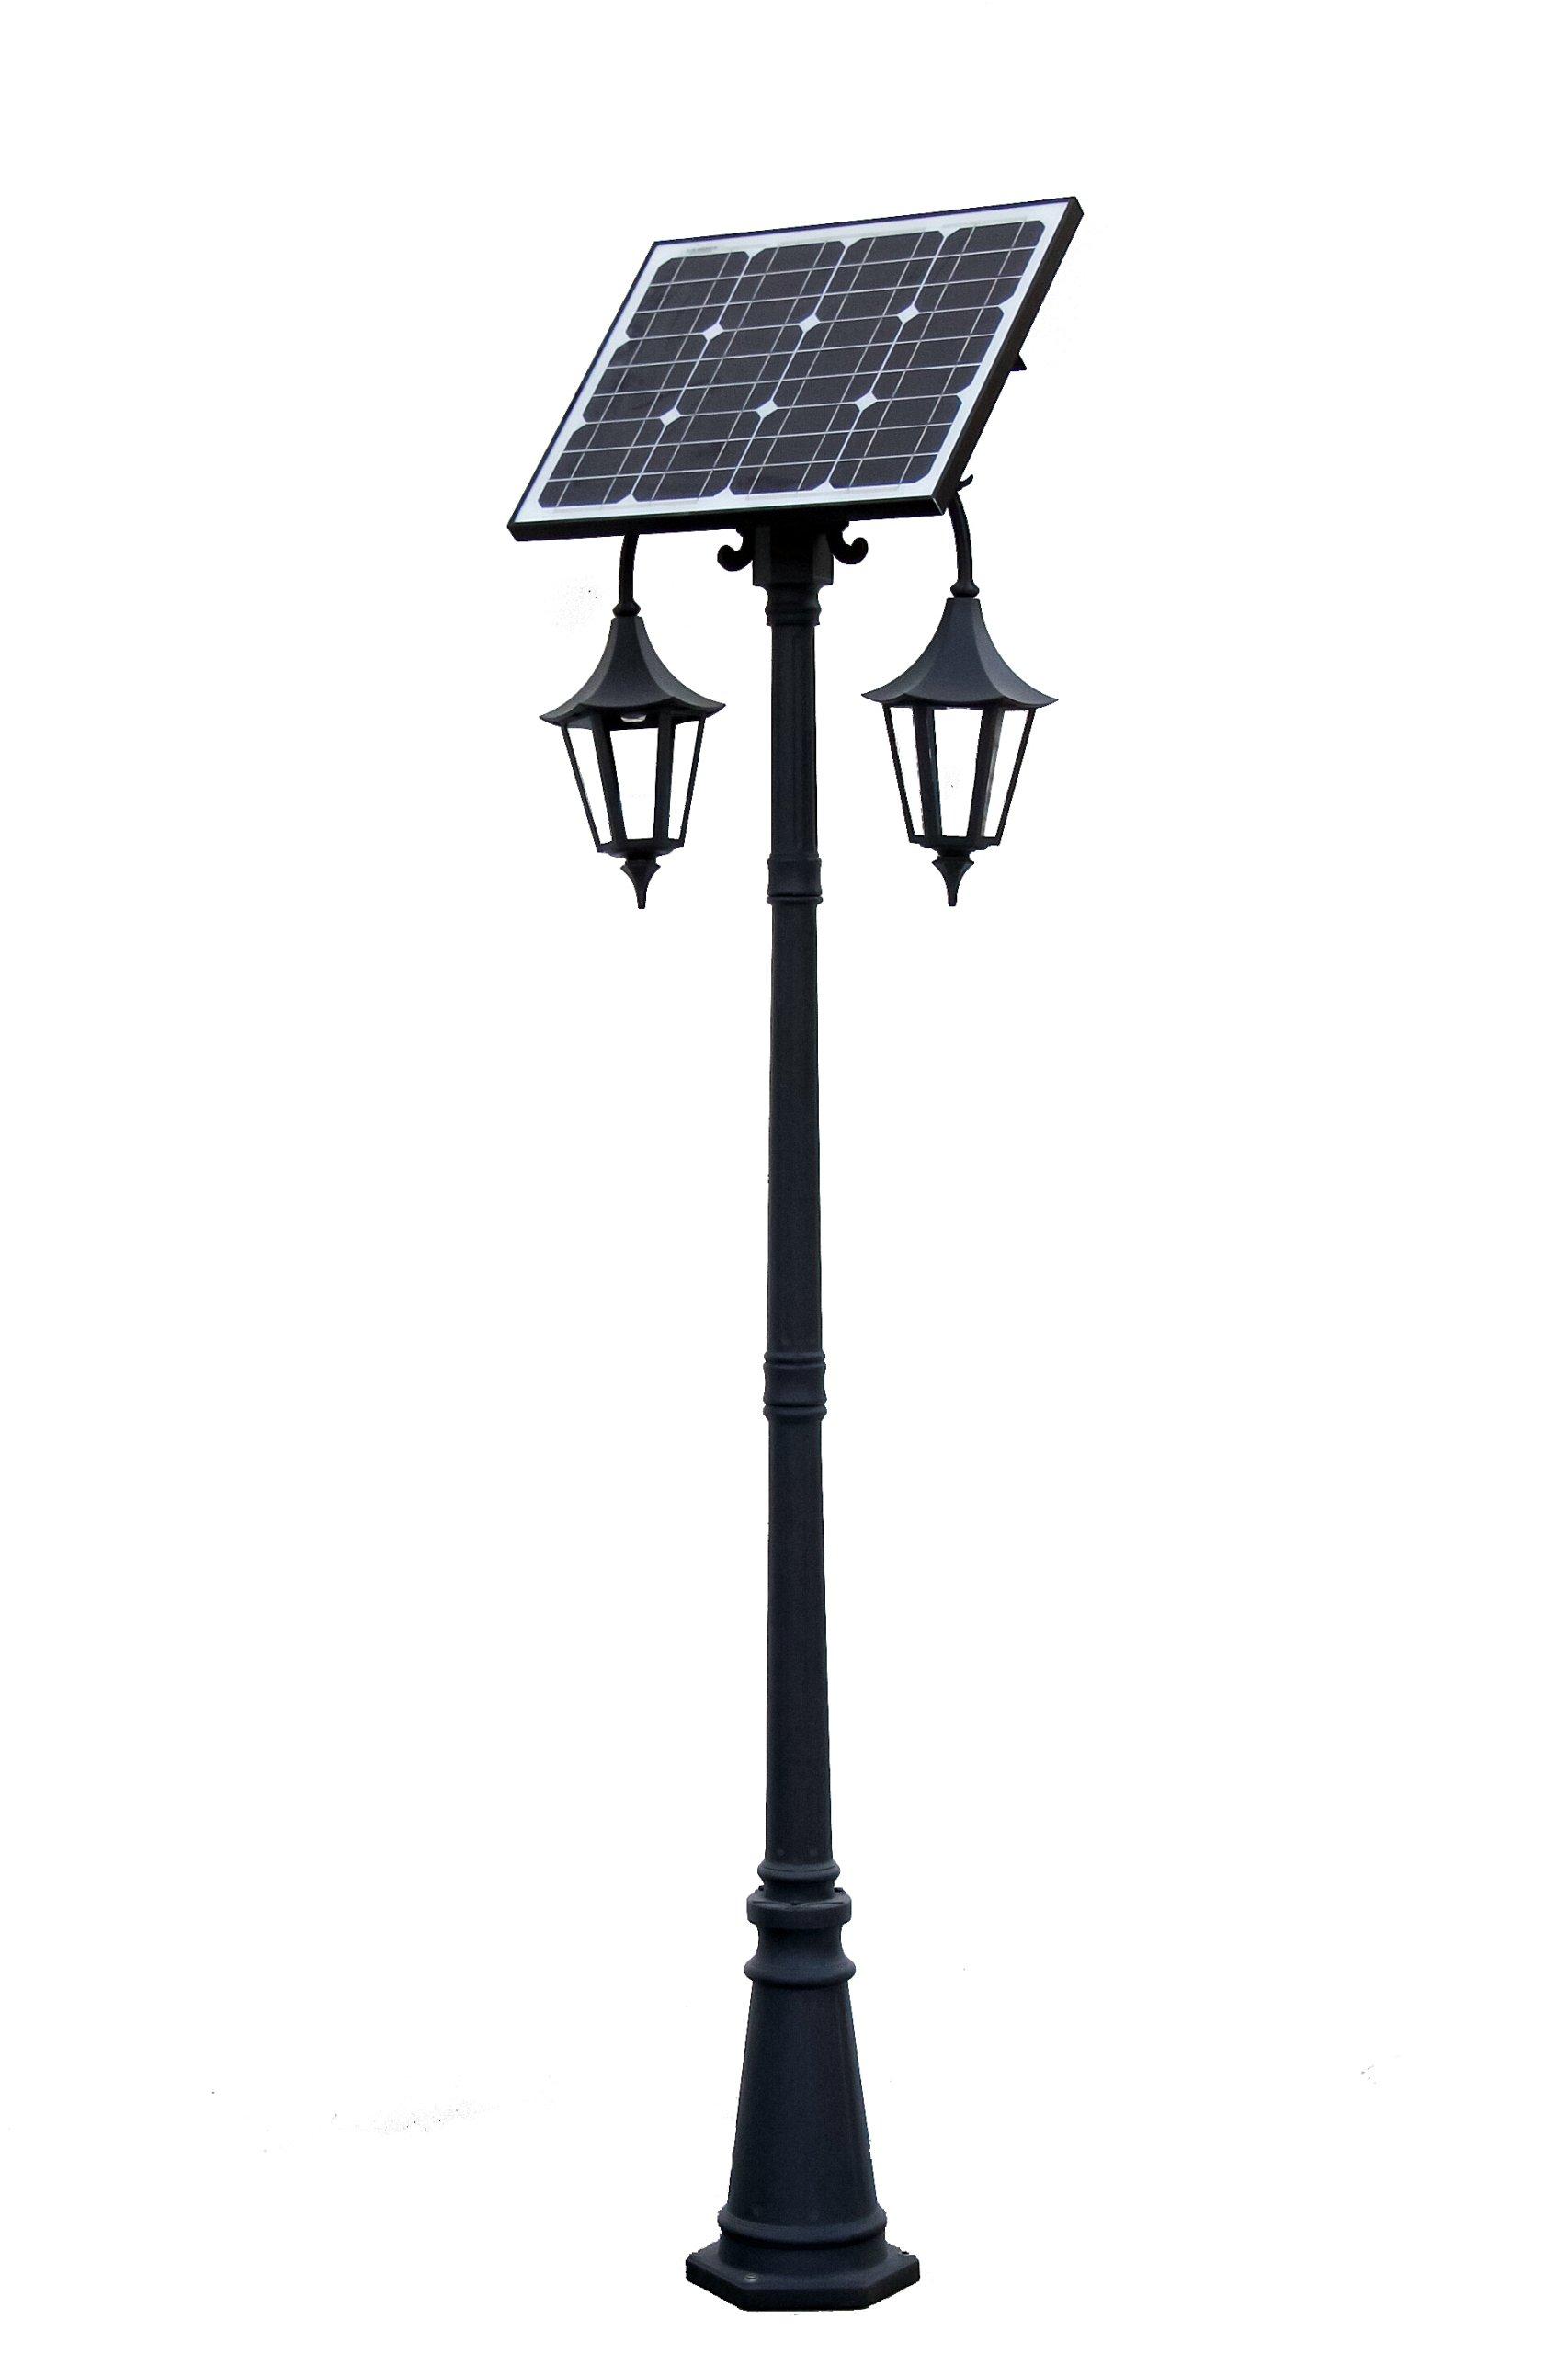 Lampy solárne svietidlo solárny Retro II 2,6 m